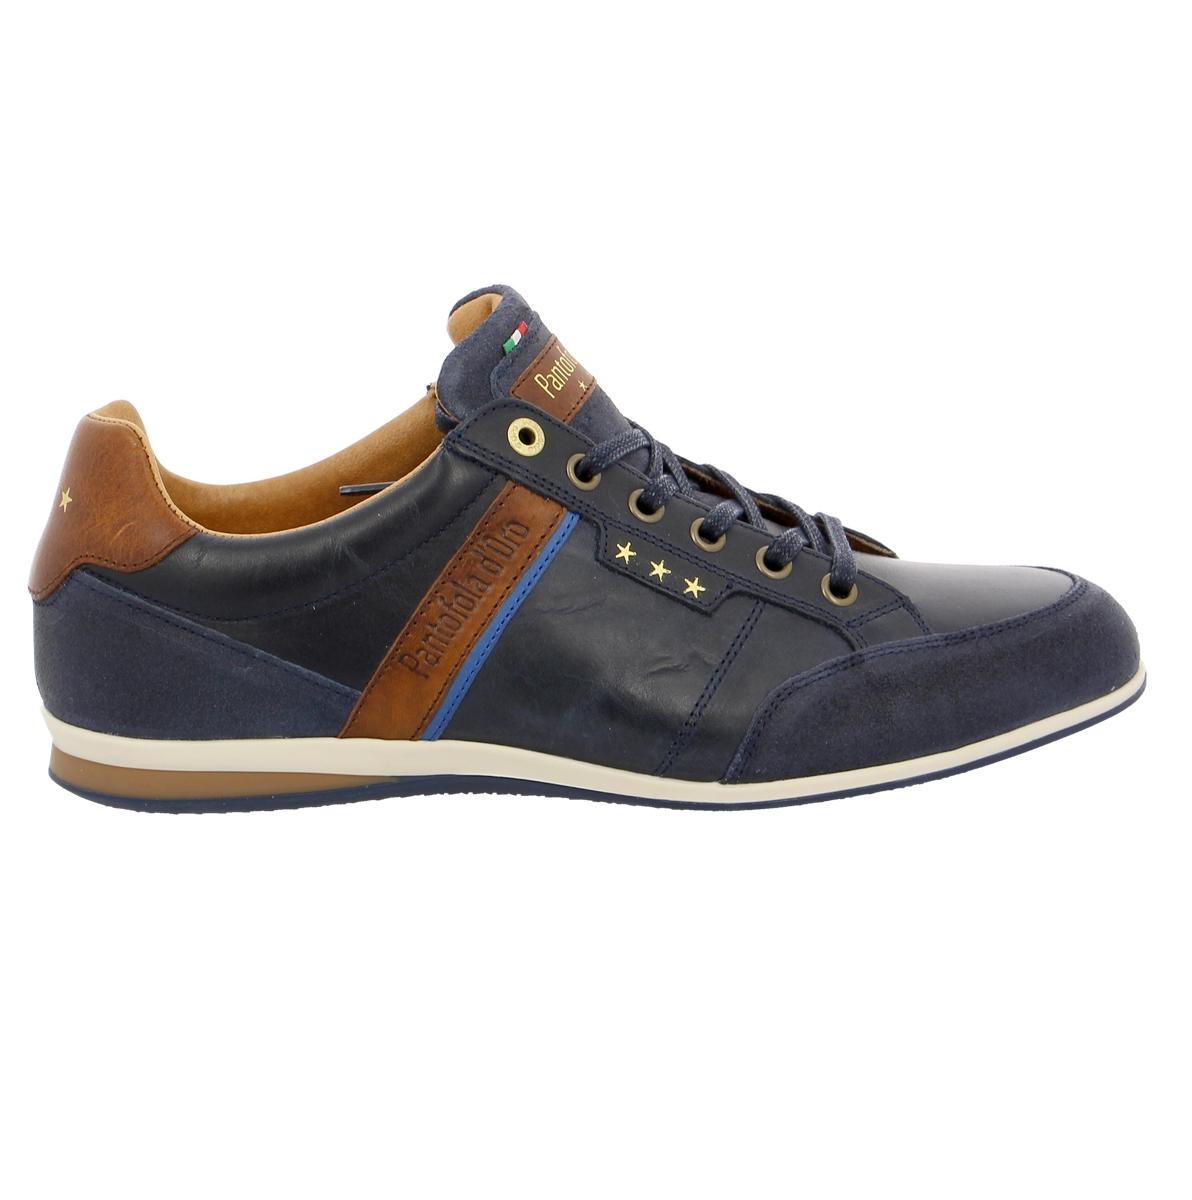 Pantofola D'oro Basket bleu